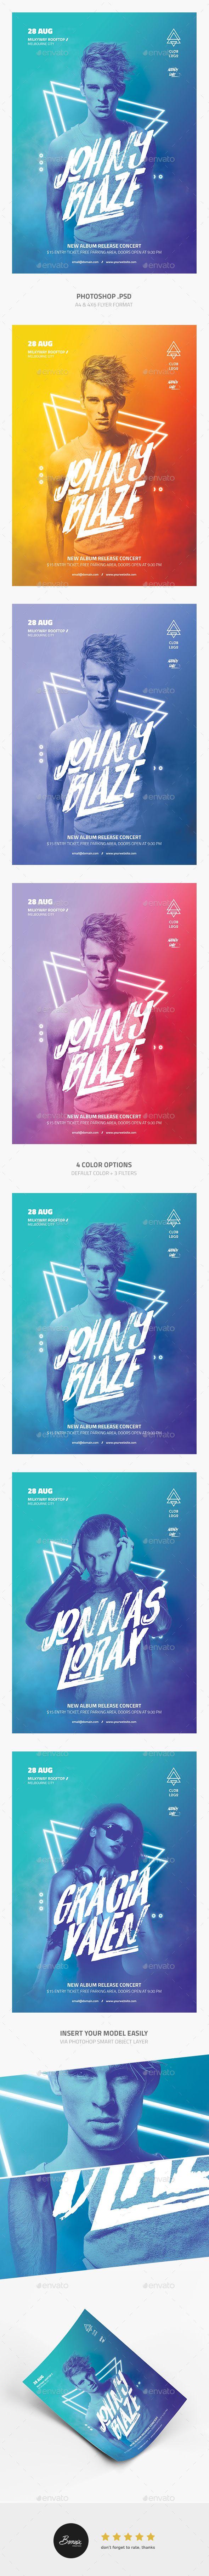 DJ Concert Flyer — Photoshop PSD #photoshop #electonic dance music • Available here → https://graphicriver.net/item/dj-concert-flyer/19673649?ref=pxcr